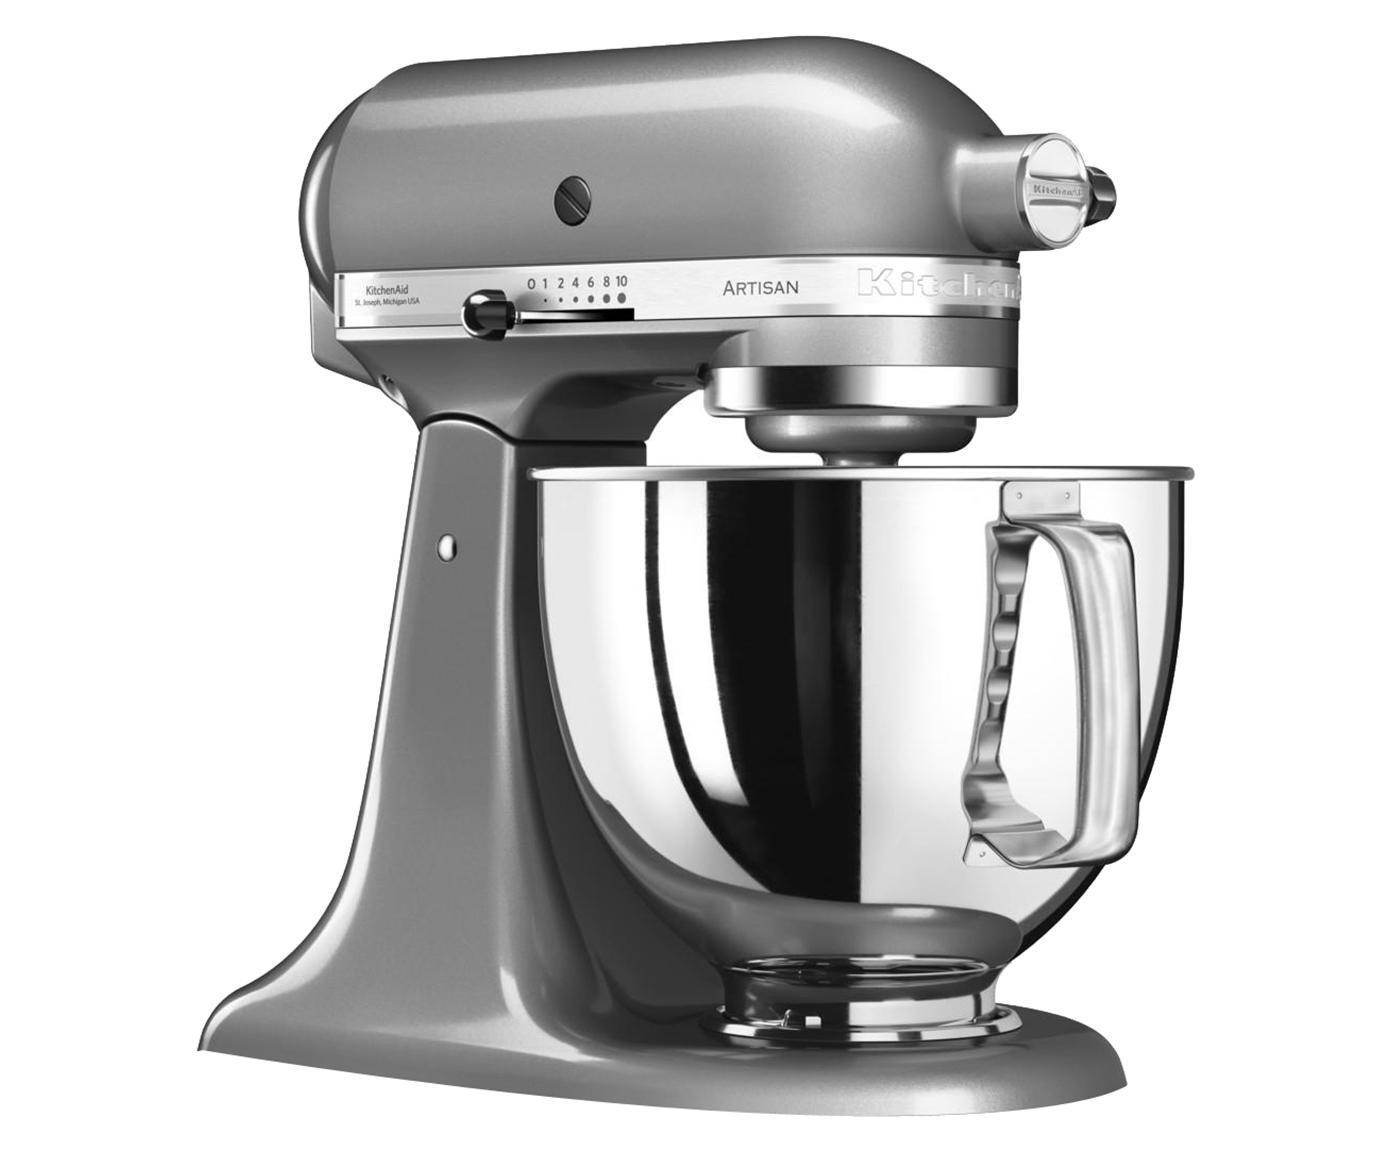 Robot da cucina - planetaria KitchenAid Artisan, Ciotola: acciaio inossidabile., Grigio argento, L 37 x P 24 cm